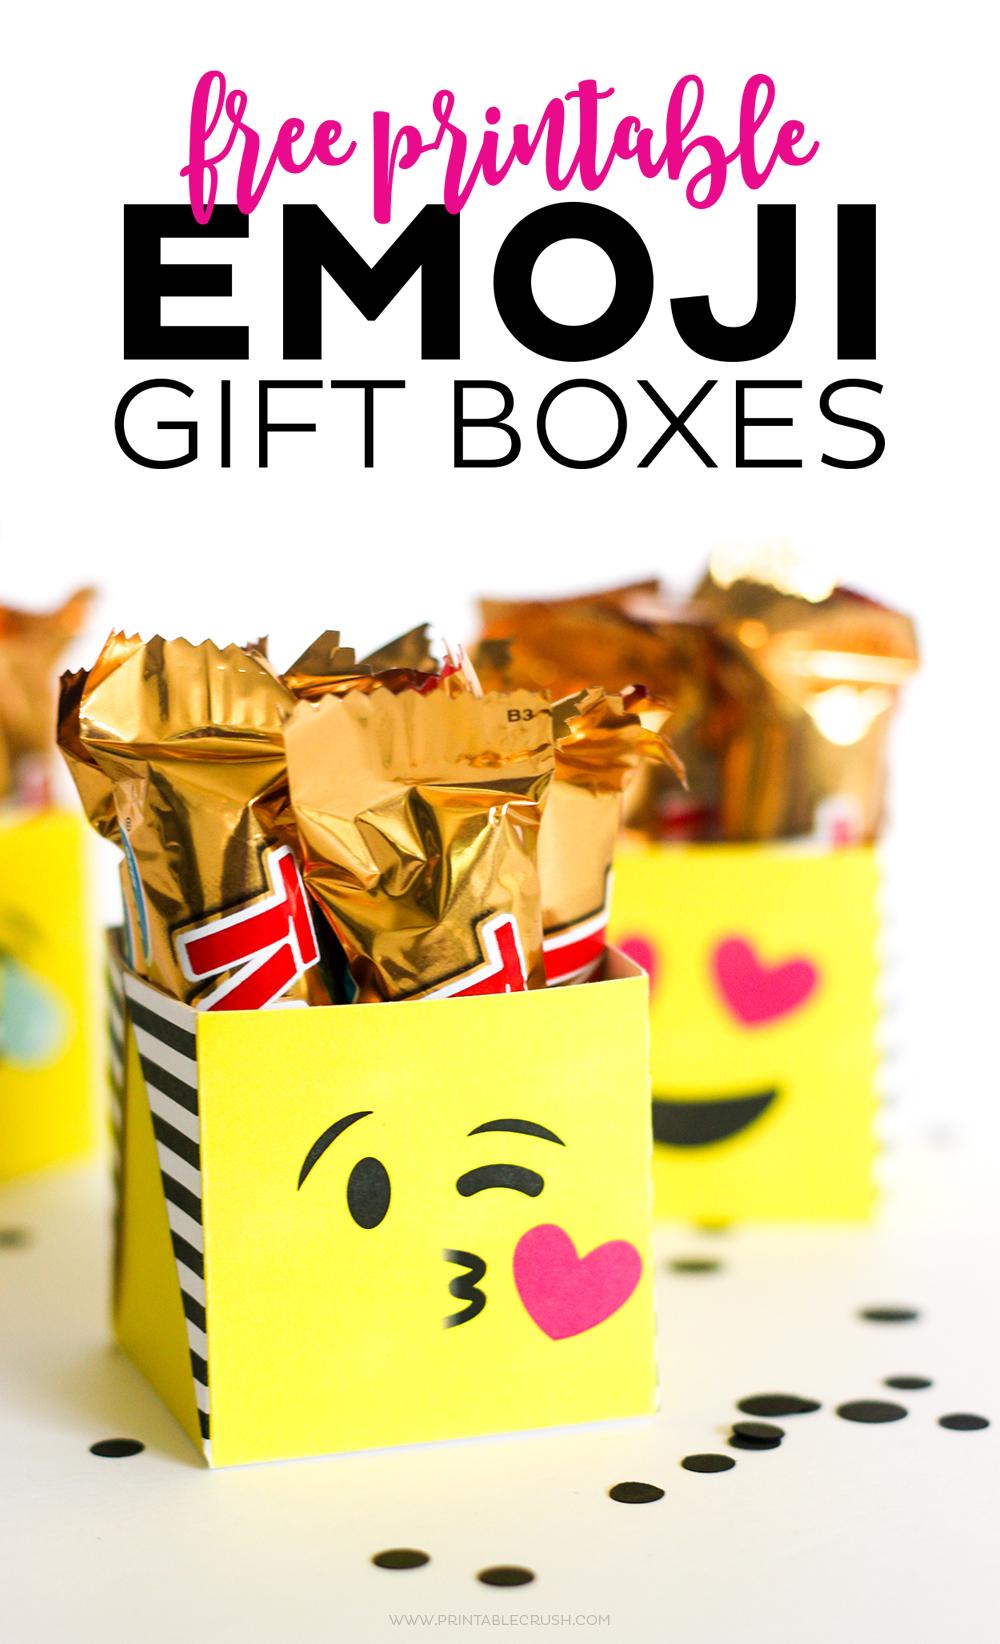 FREE Printable Emoji Gift Boxes